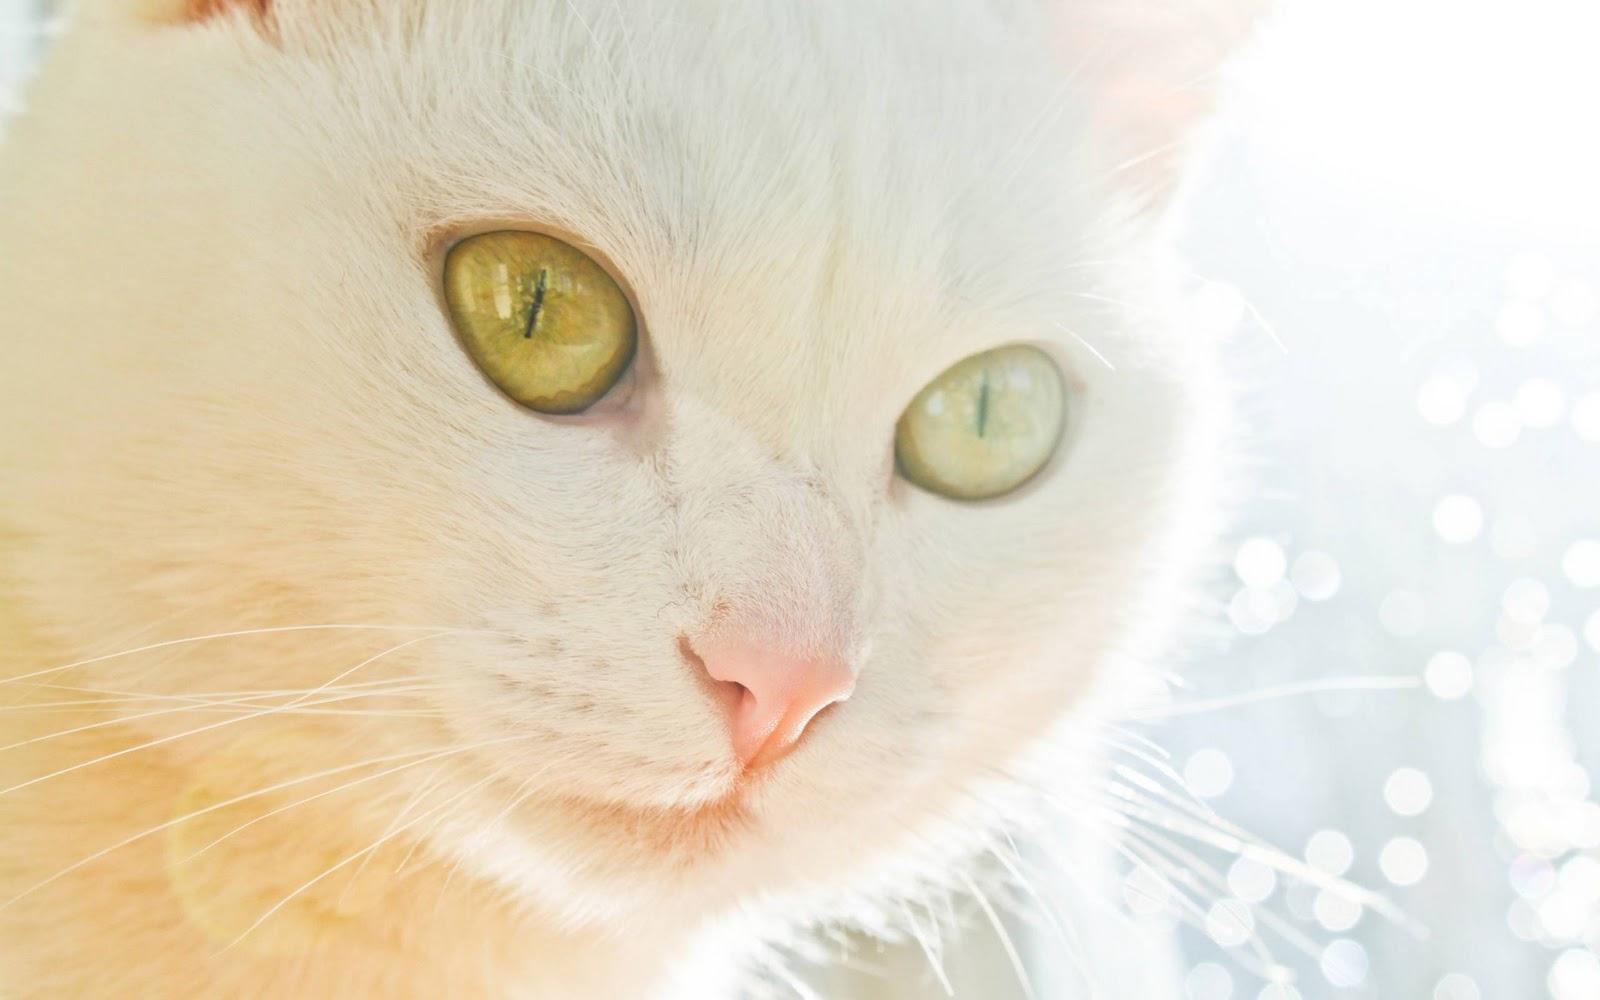 http://3.bp.blogspot.com/-RDERrYdgLNQ/TwUplwK5-iI/AAAAAAAAGXU/I8P1bUJ0YQk/s1600/white_cat_wallpaper.jpg